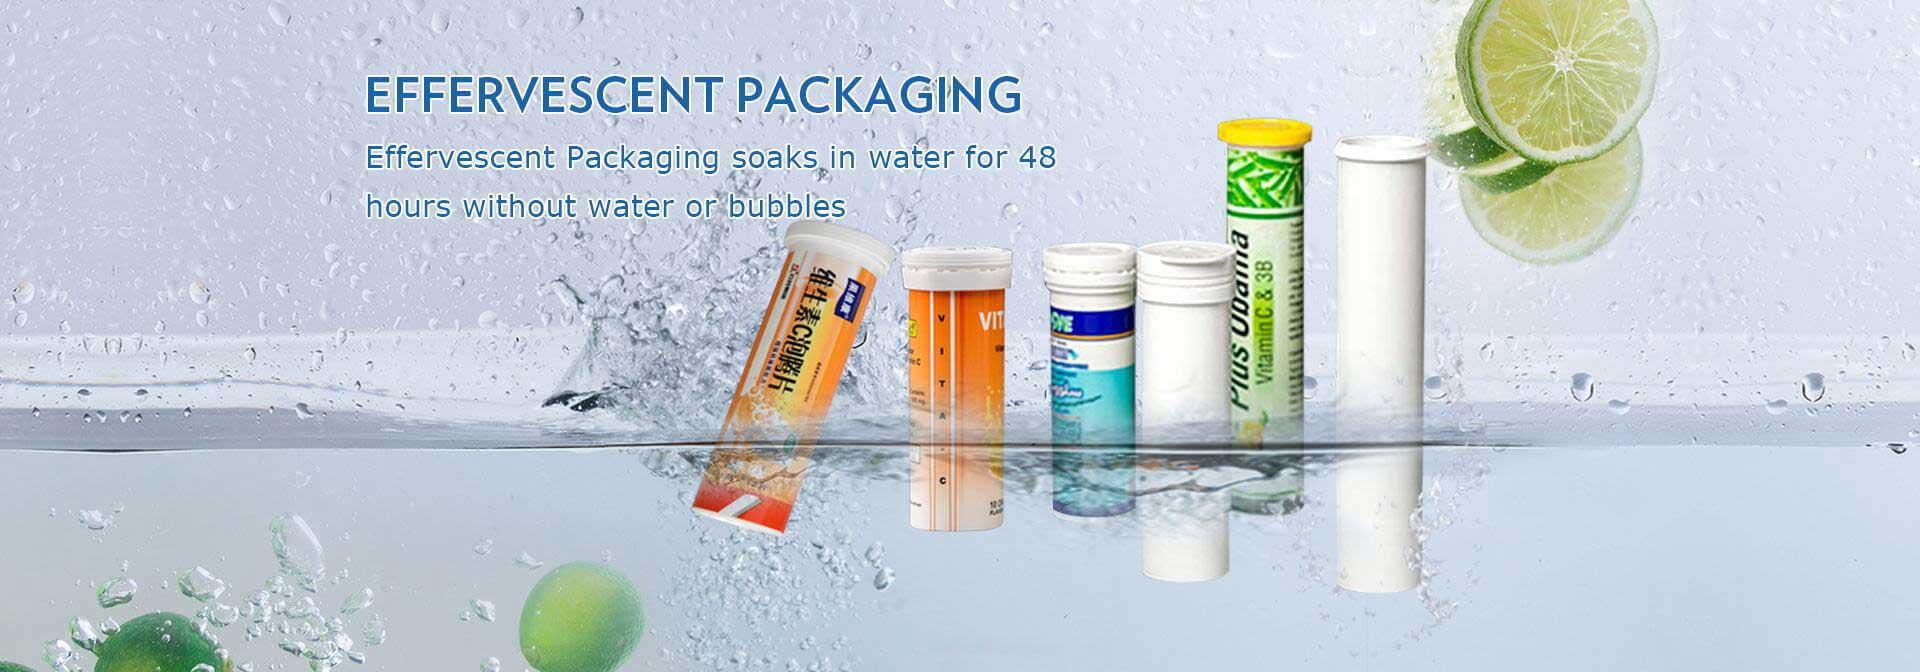 Effervescent Packaging